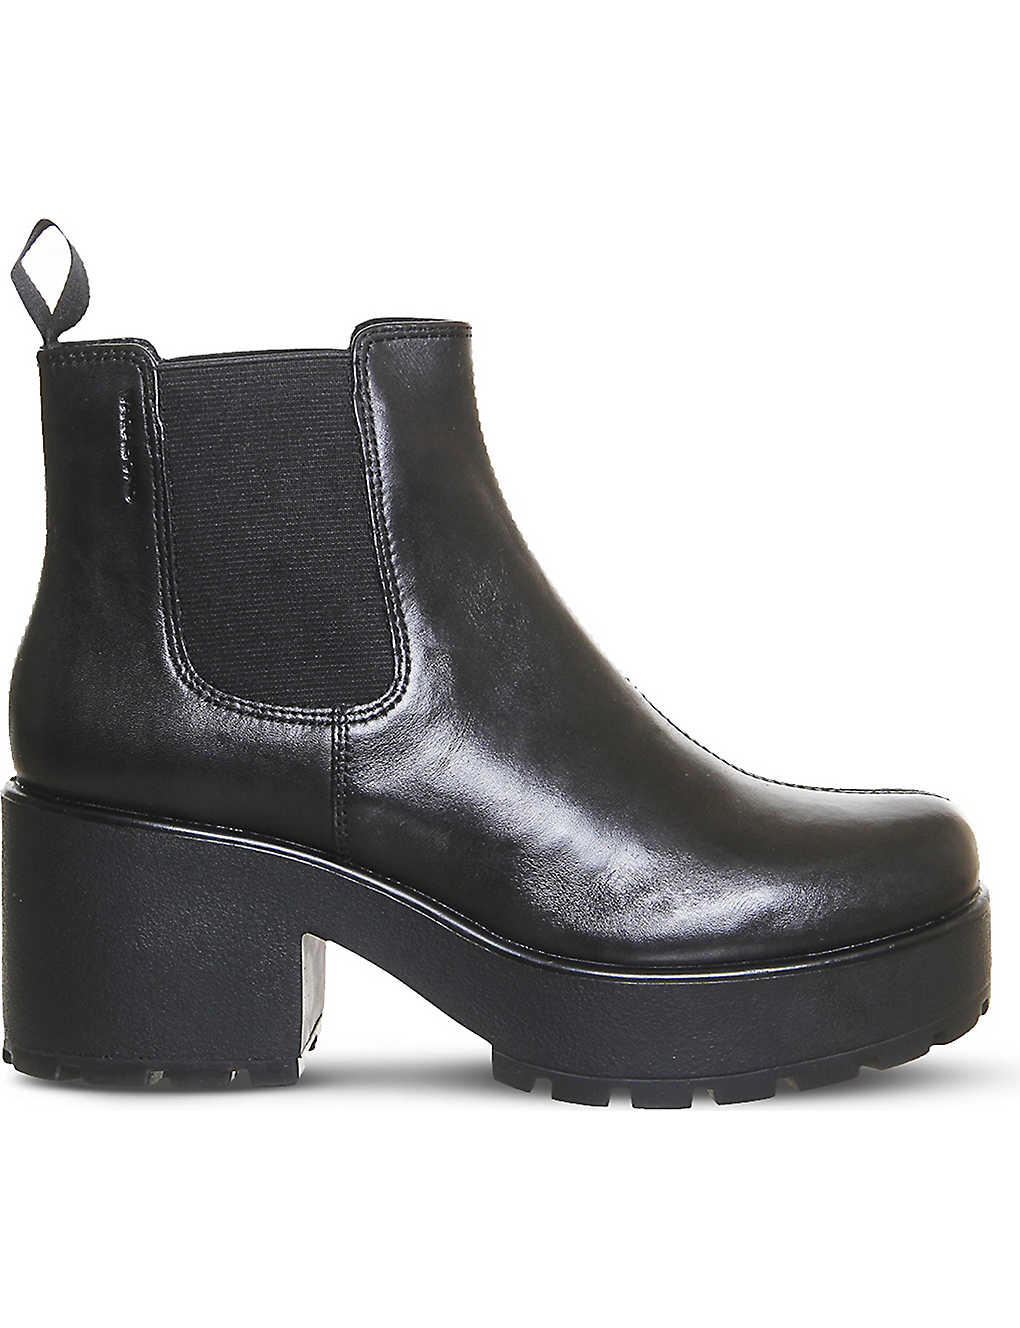 9dc6ec81a52 VAGABOND - Dioon chunky leather Chelsea boots | Selfridges.com